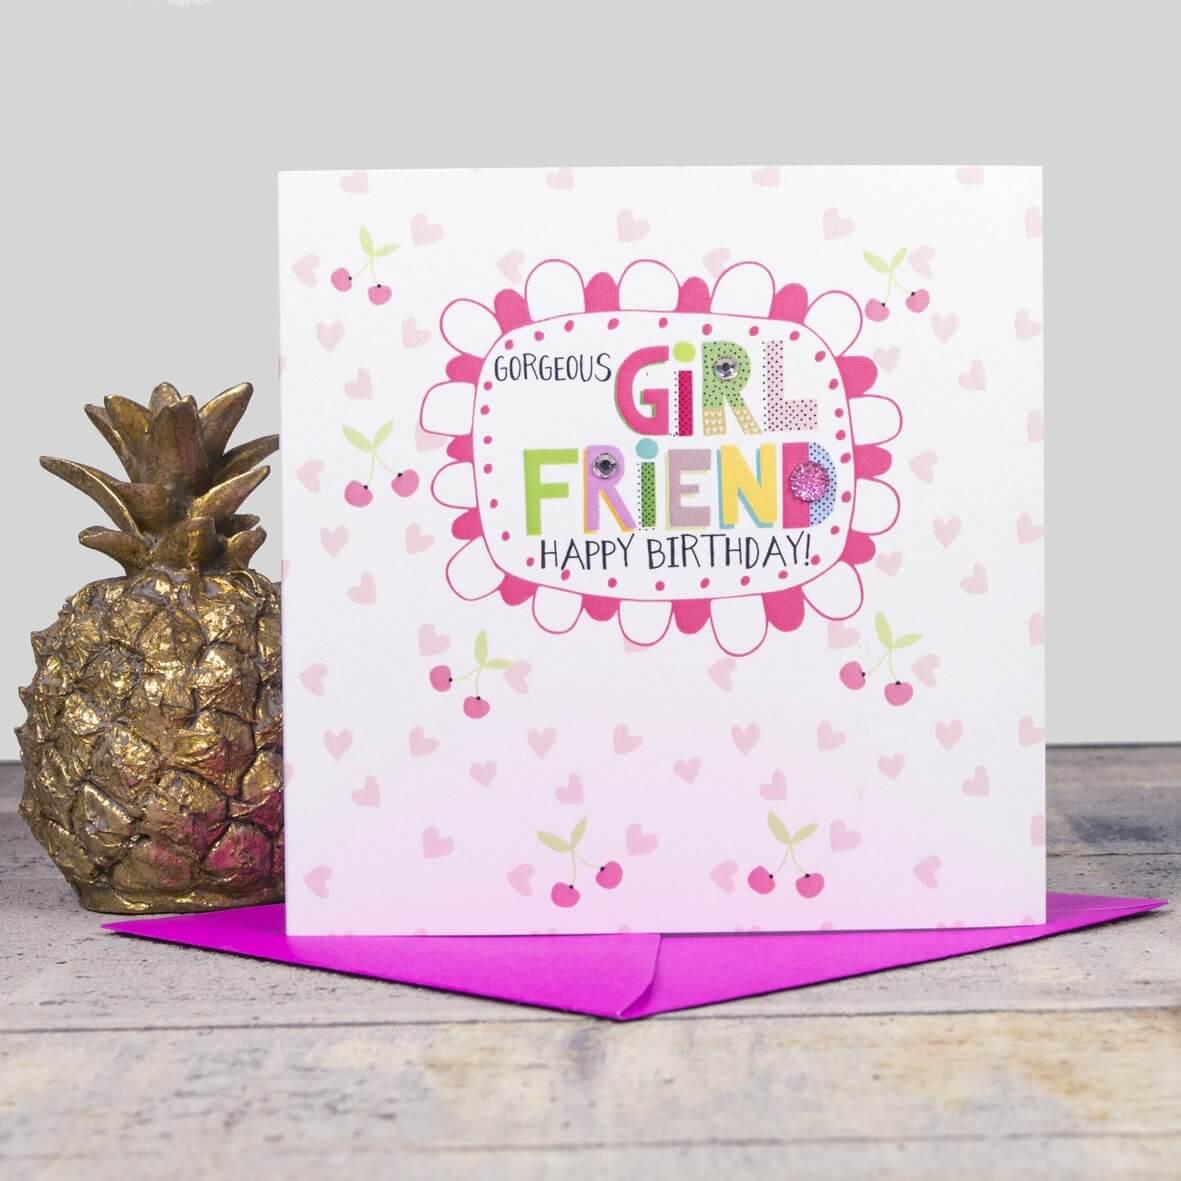 Gorgeous Girlfriend - Happy Birthday Card